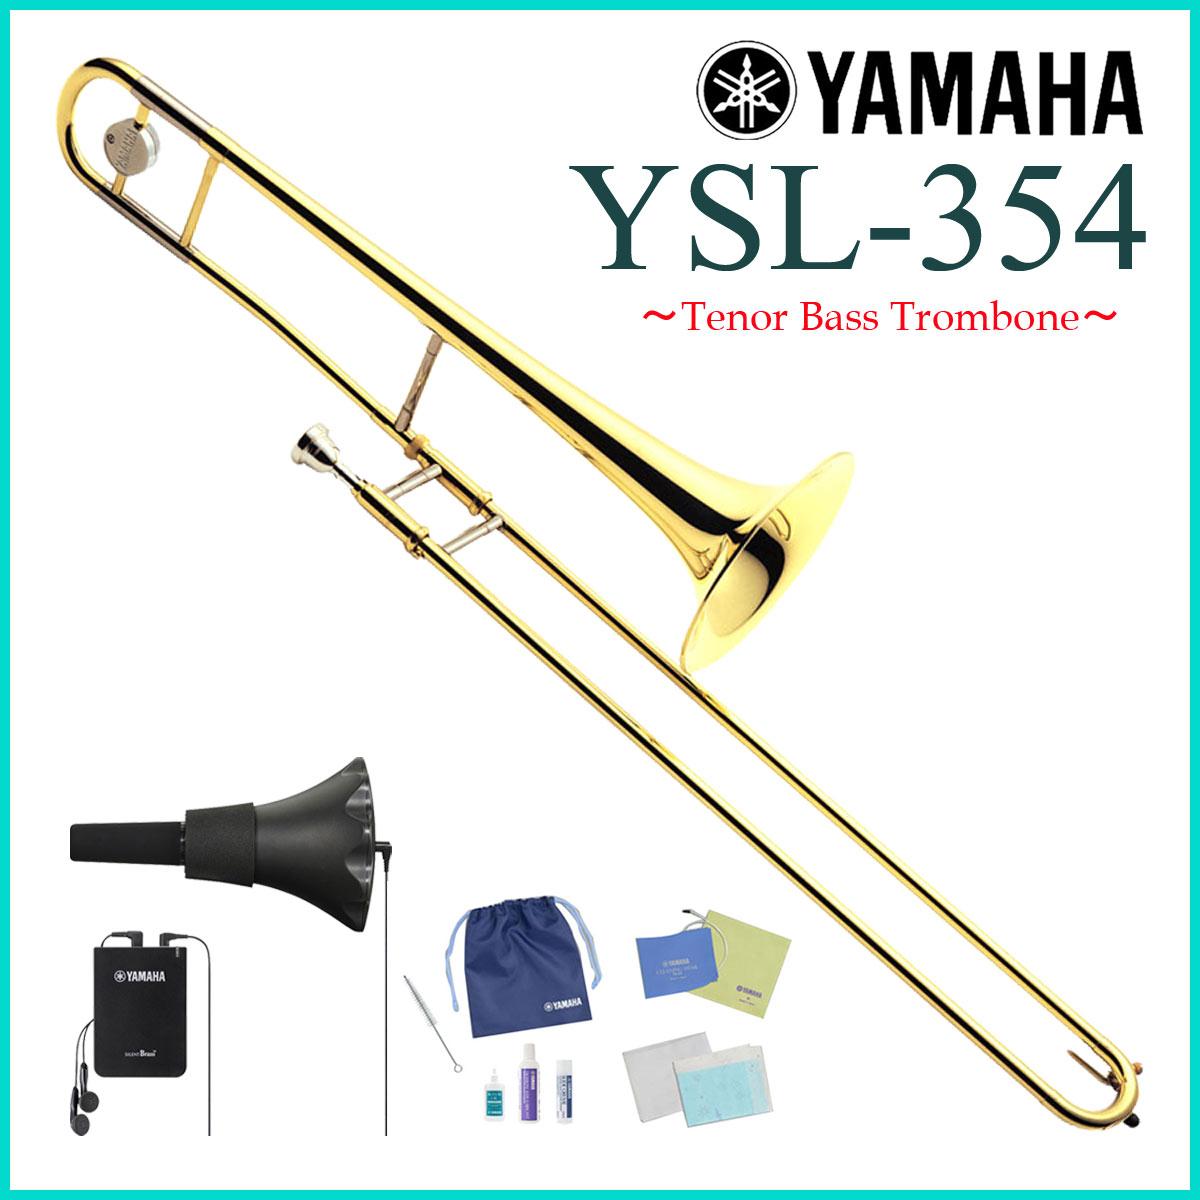 YAMAHA / YSL-354 ヤマハ トロンボーン Torombone YSL354 サイレントブラスセット《未展示倉庫保管品※もちろん出荷前調整》《5年保証》